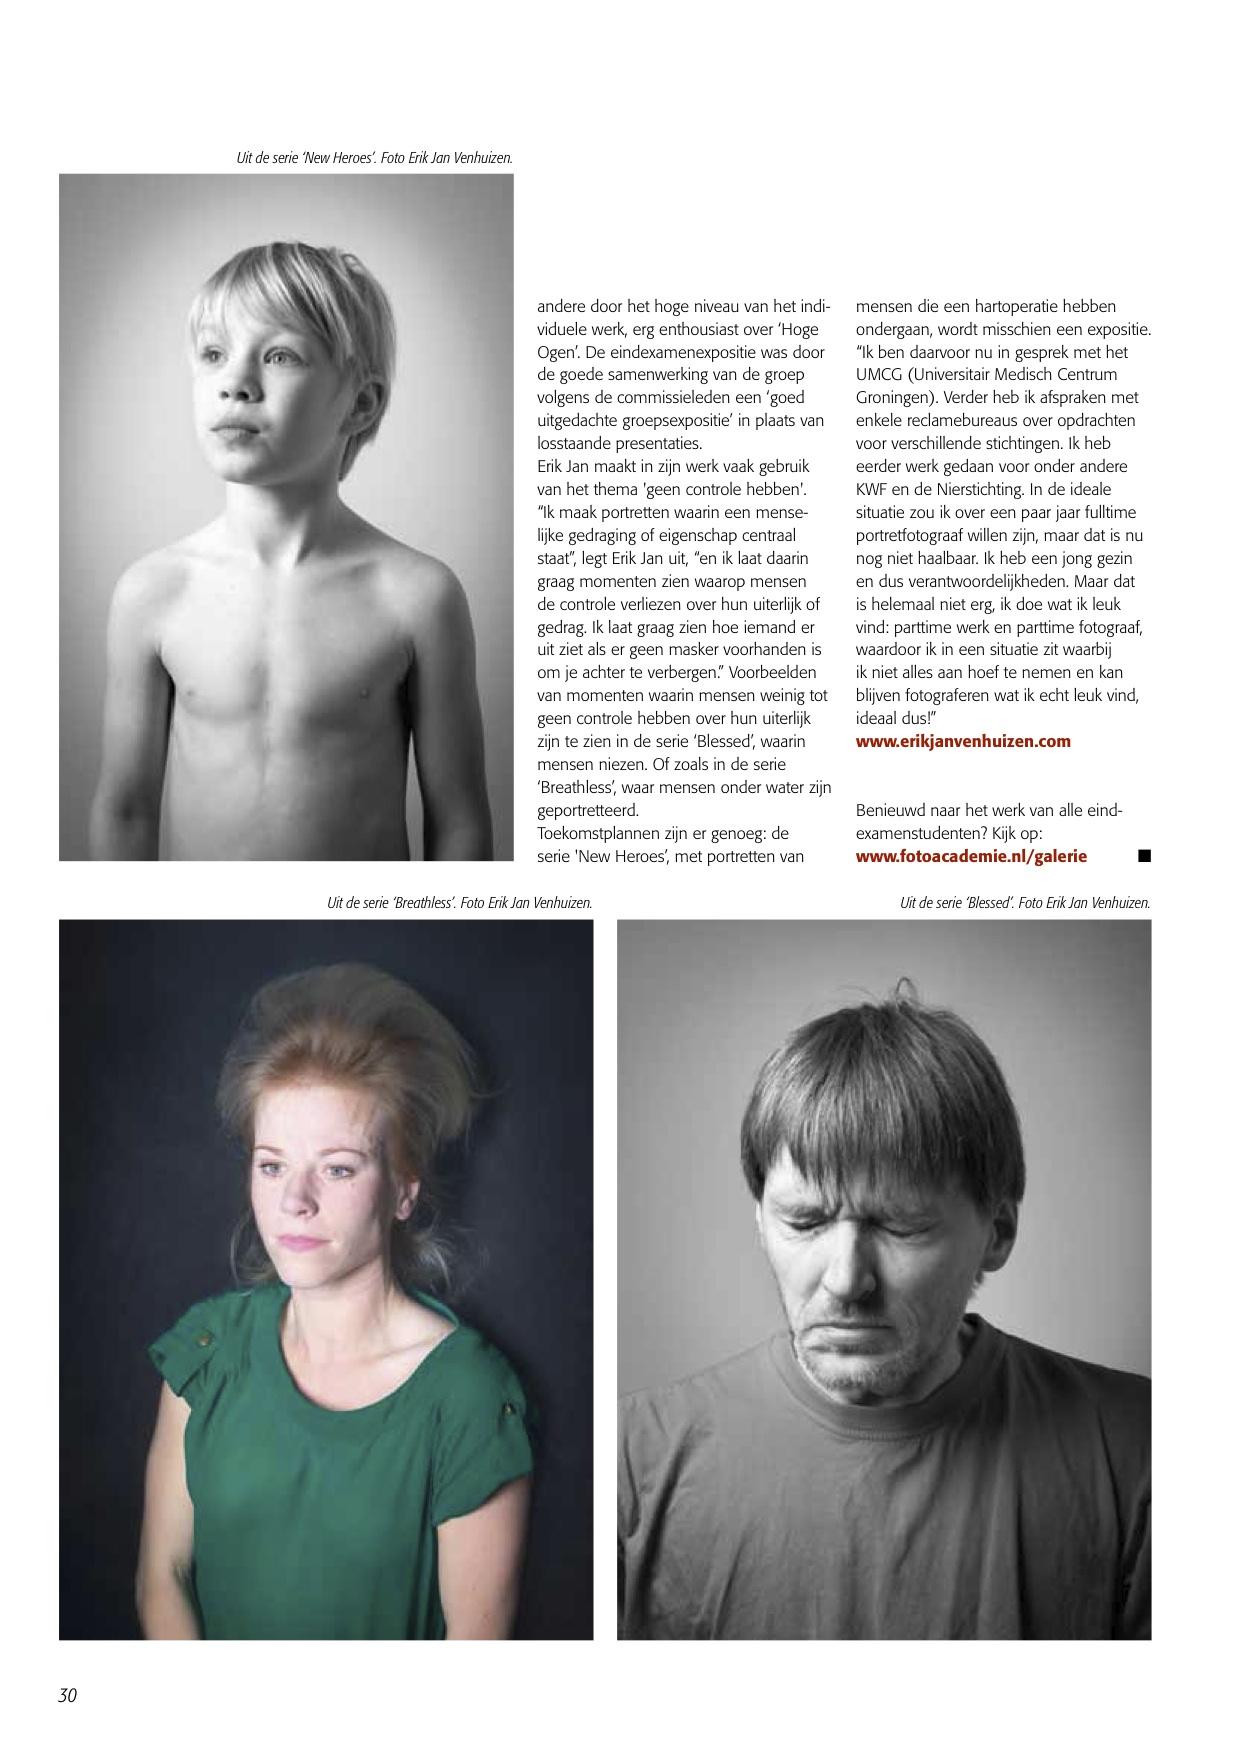 De Fotograaf-eindexamen 2012 4v4